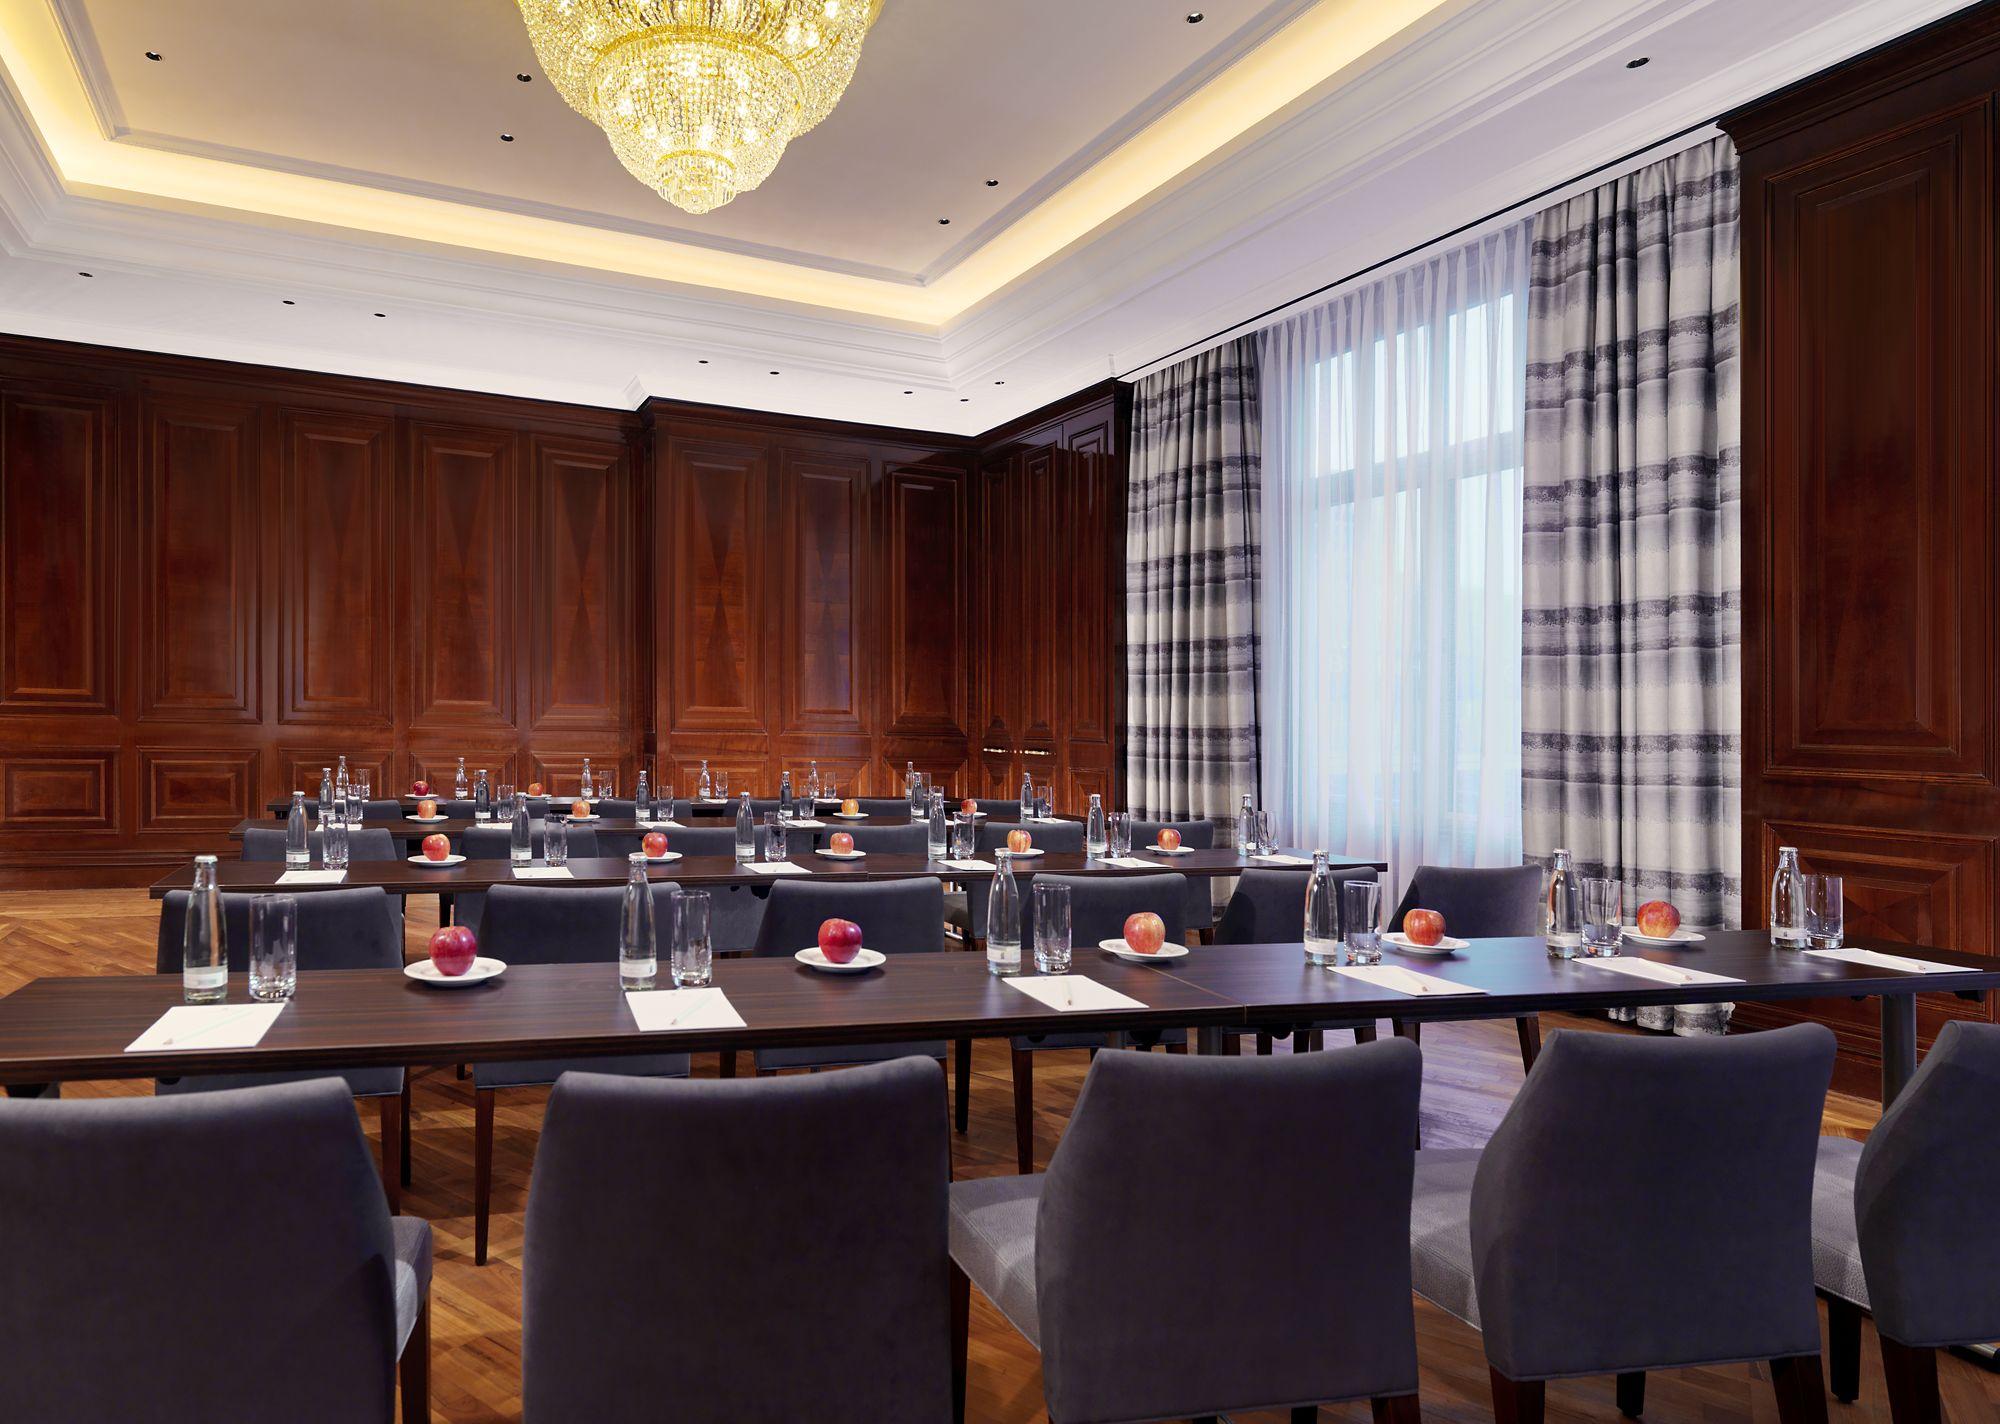 Conference Room Berlin - Berlin Meeting Space | The Ritz-Carlton, Berlin